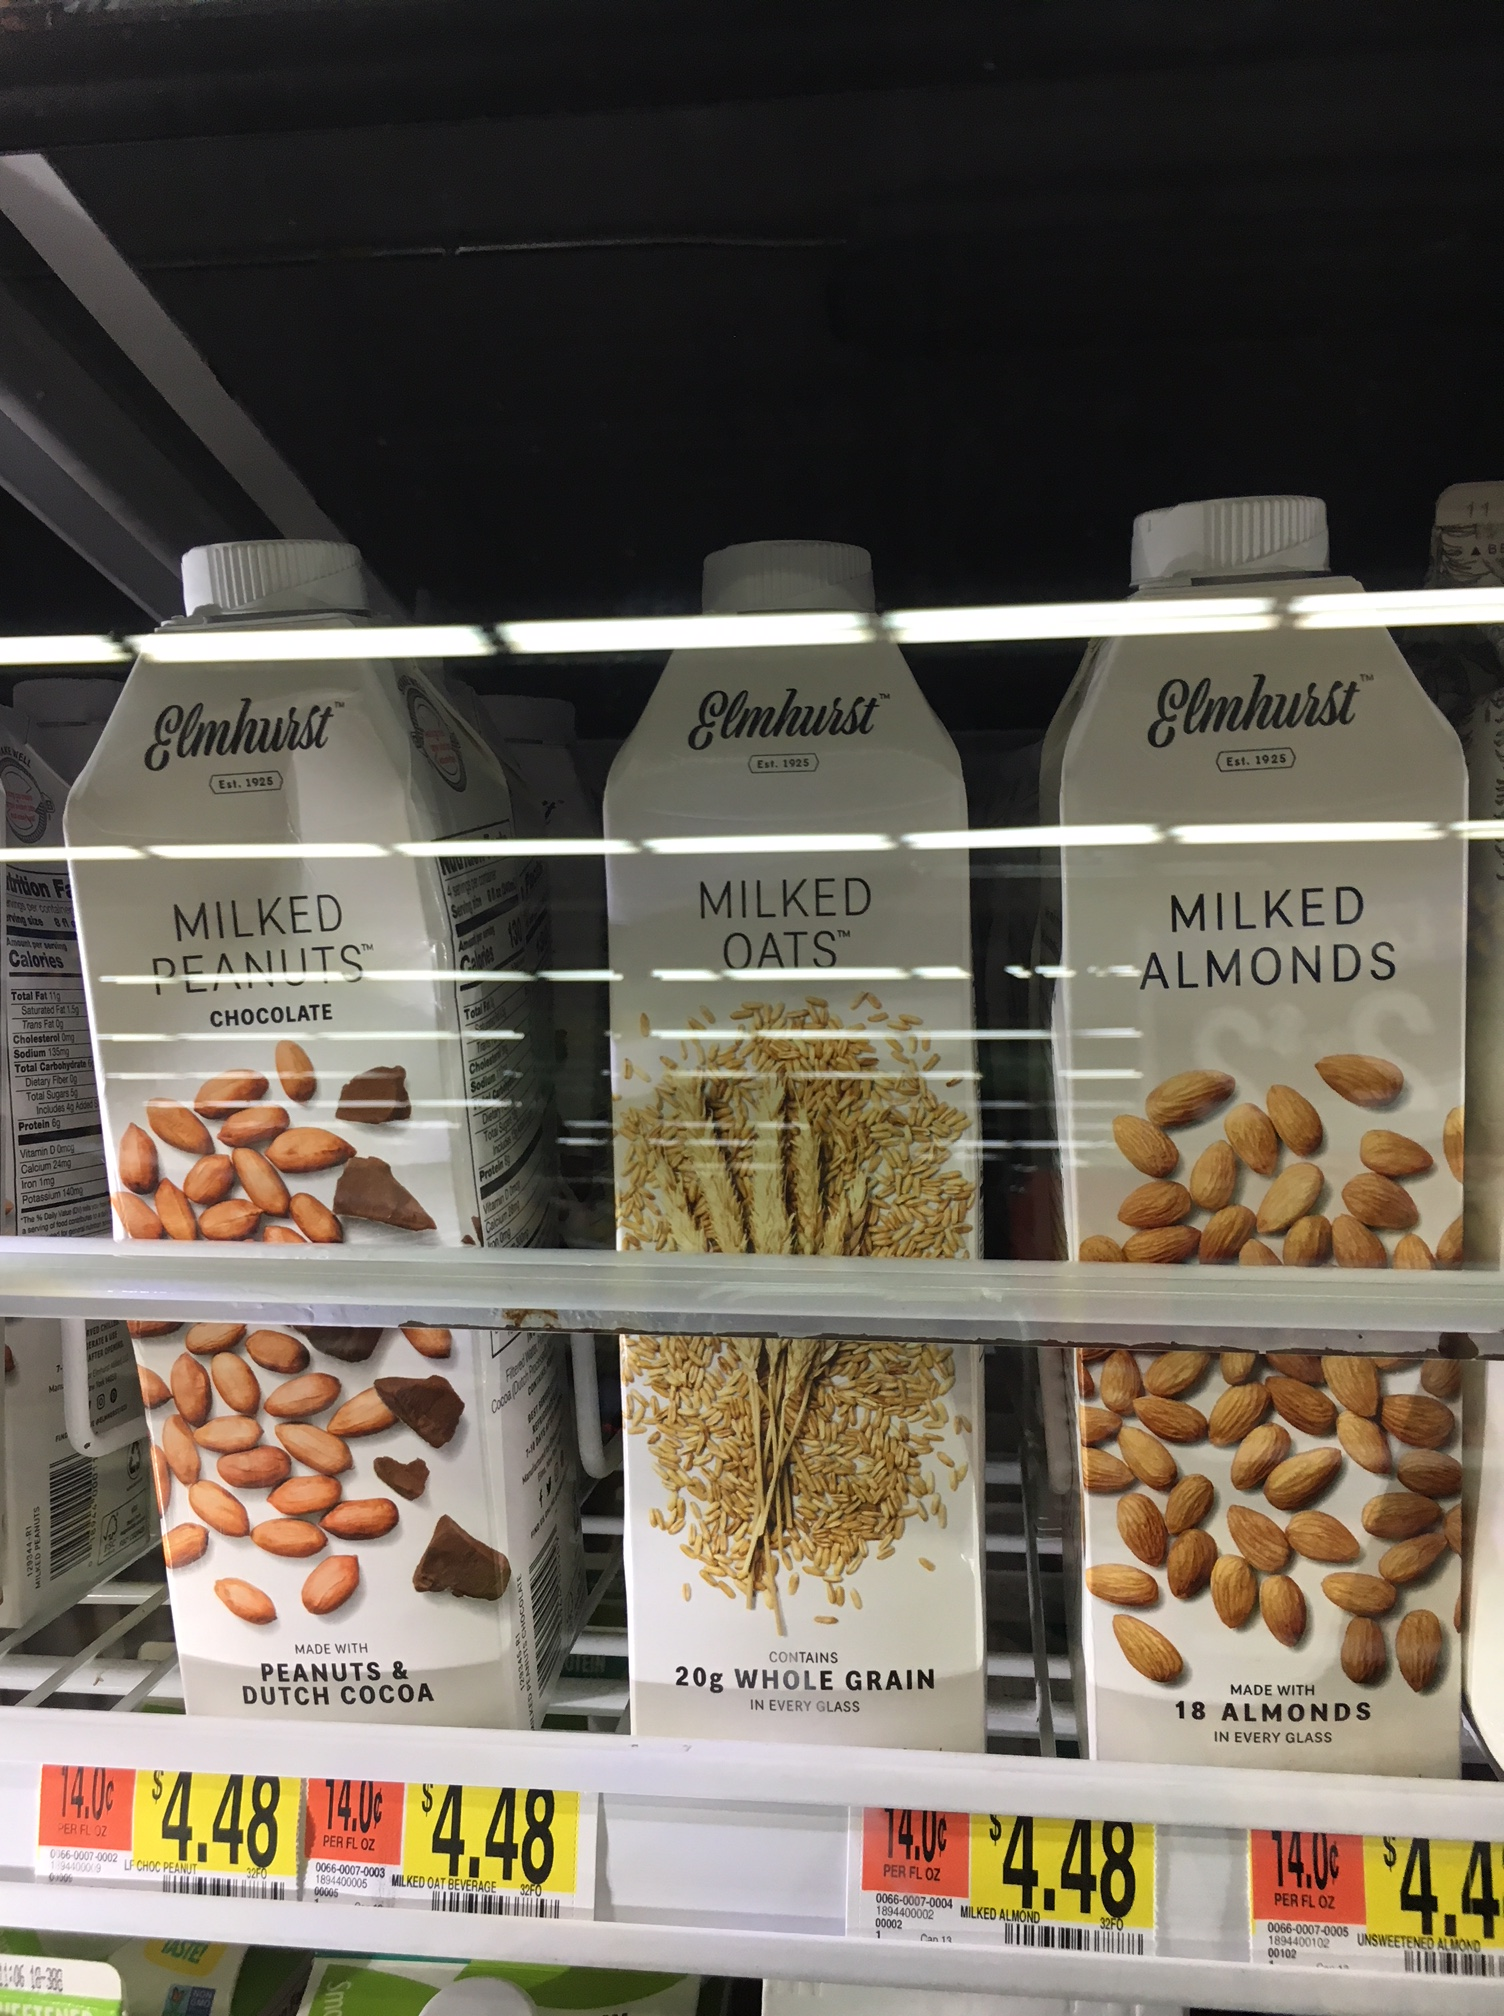 lactose free milk options at walmart